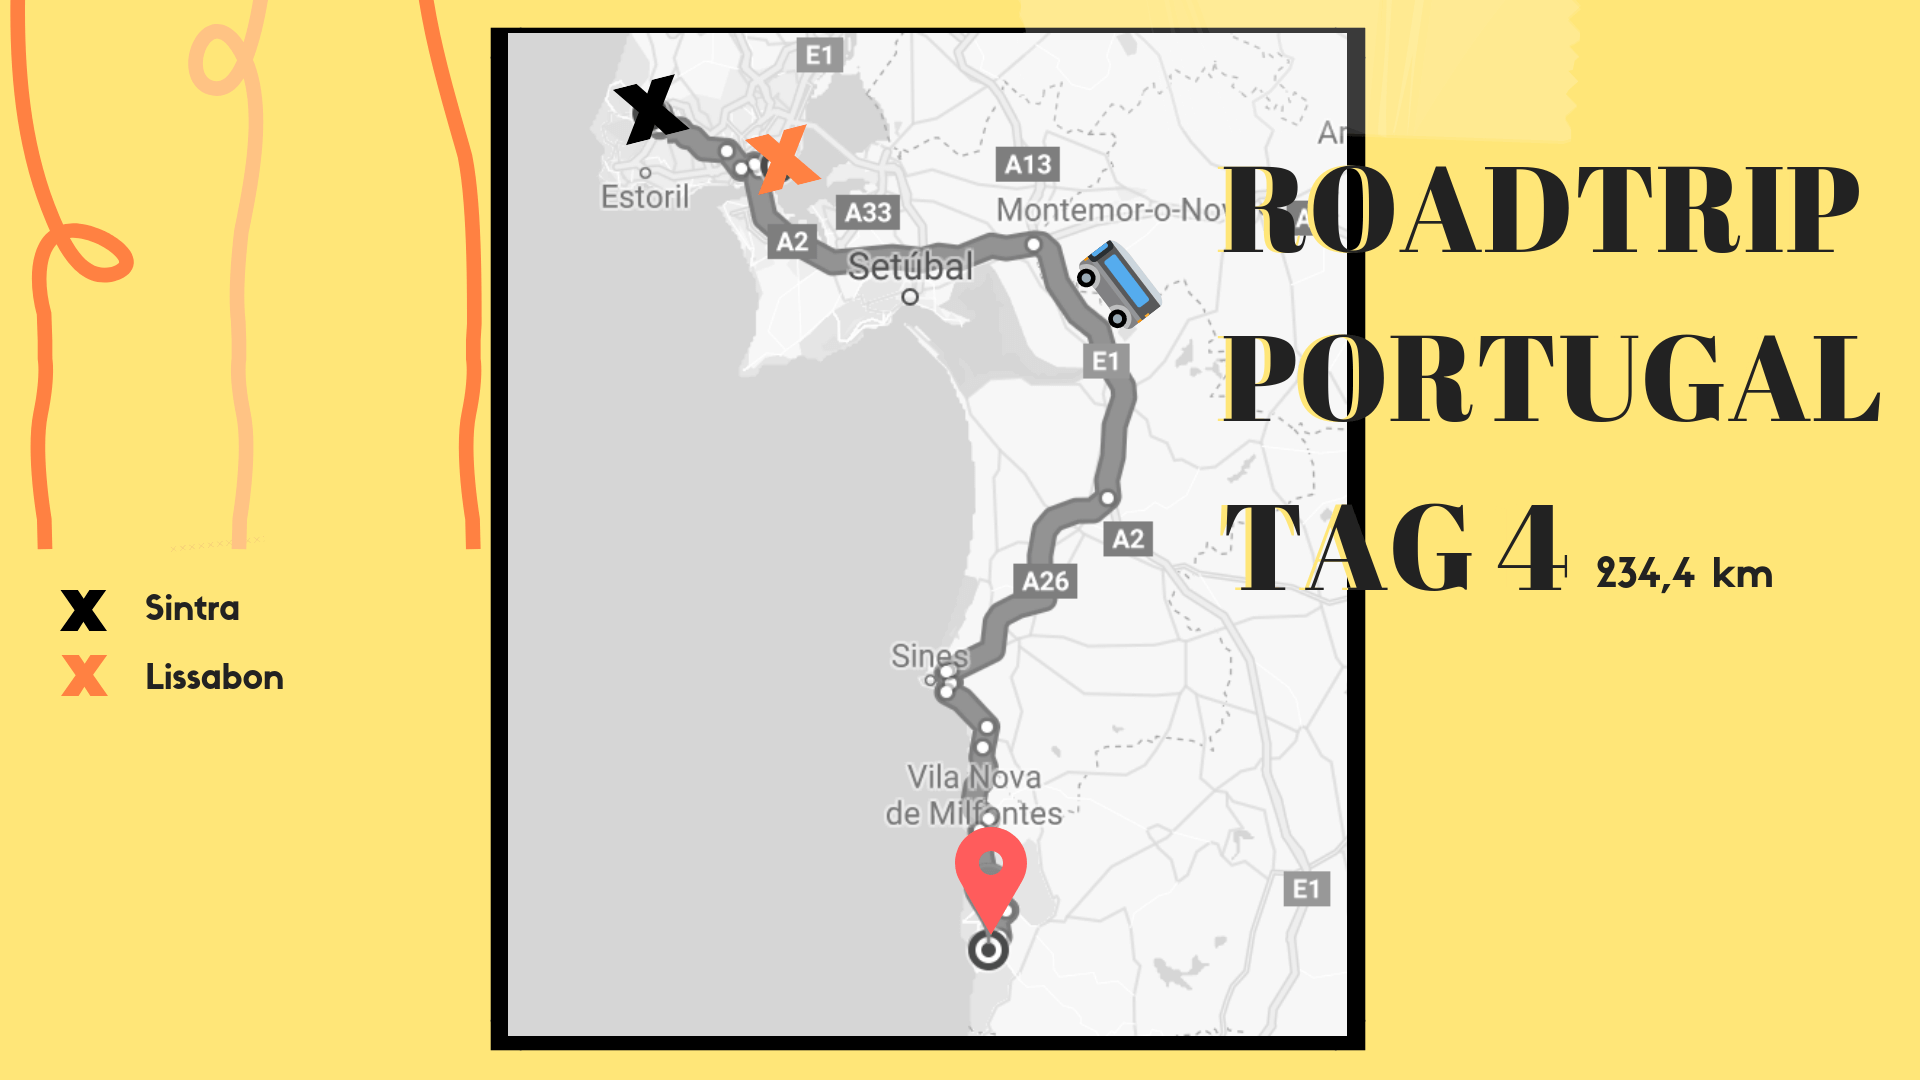 Roadtrip Portugal, Route Tag 4, 22